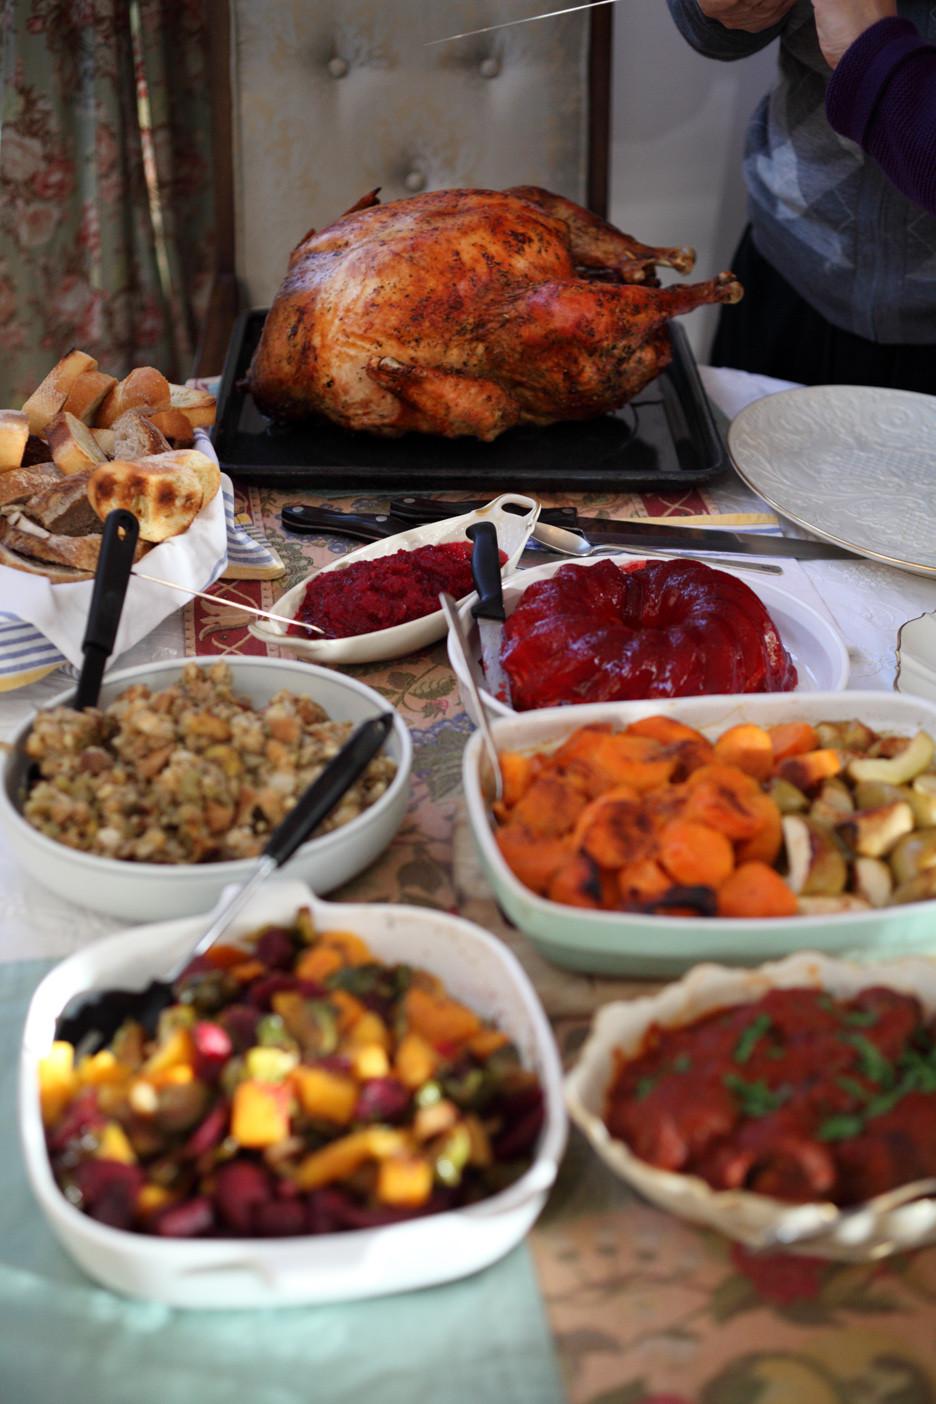 Typical Thanksgiving Dinner  What's for Thanksgiving Dinner Turkey or Cormorant